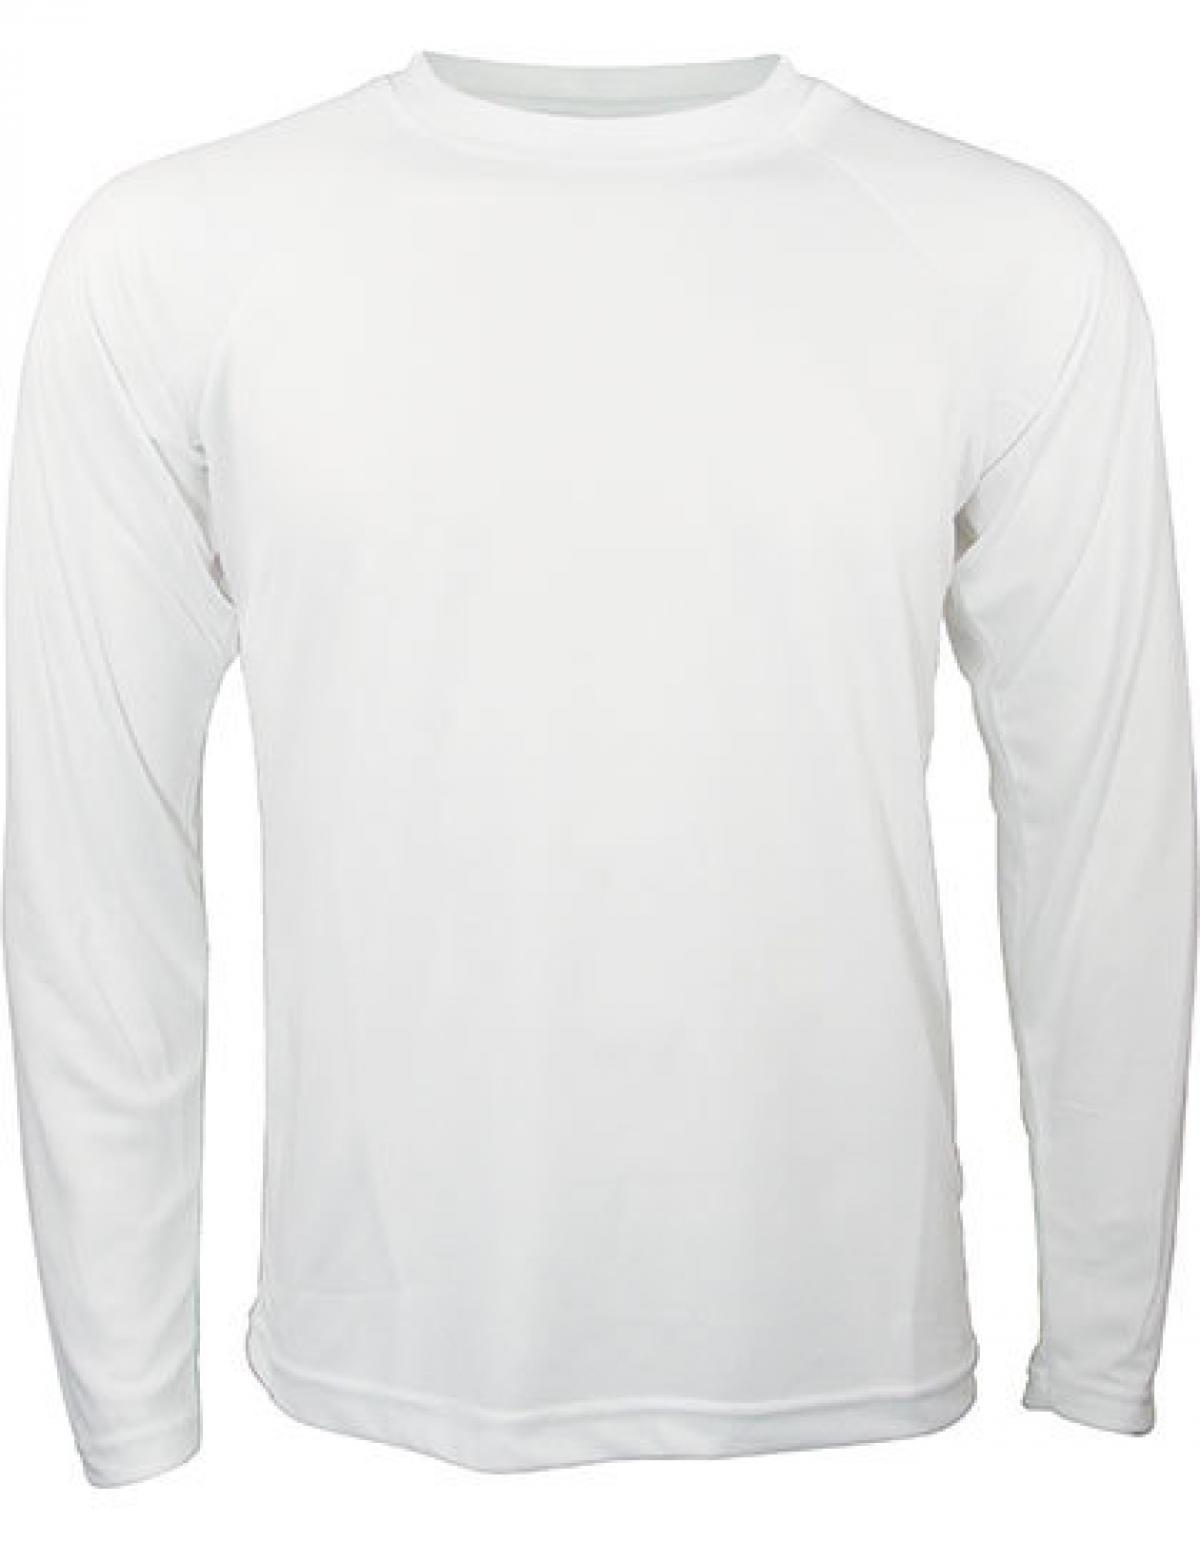 100% authentic 613b4 ac0b0 Herren Langarm Funktions-Shirt Basic | | Oltees